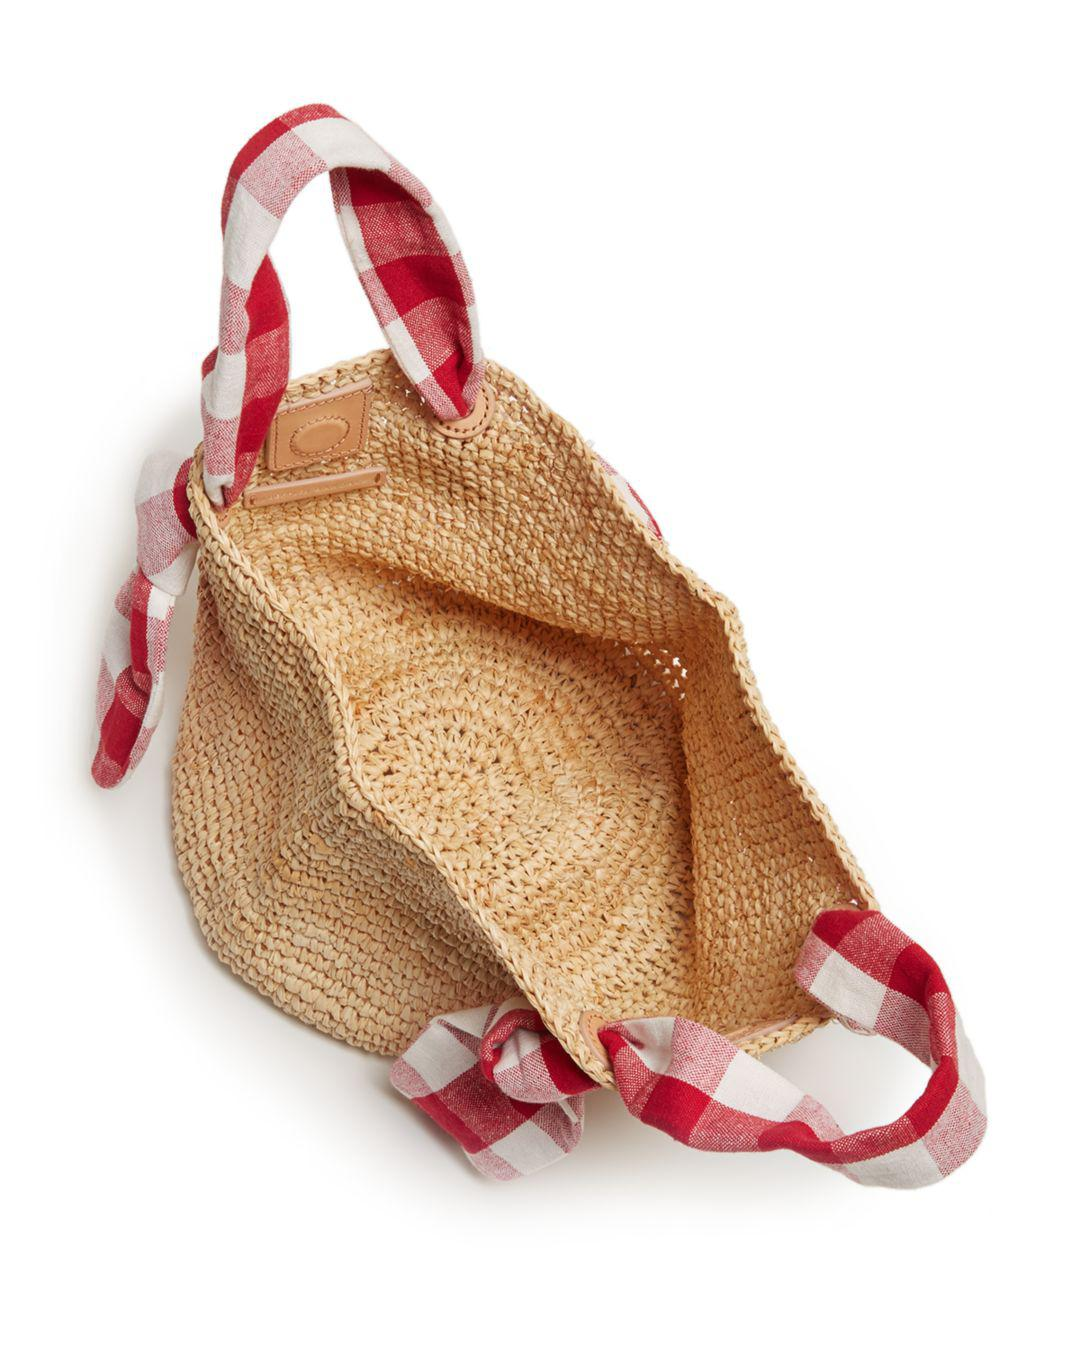 82e90e2e0a4 Loeffler Randall Hazel Checkered Tie Straw Tote - Save 60% - Lyst